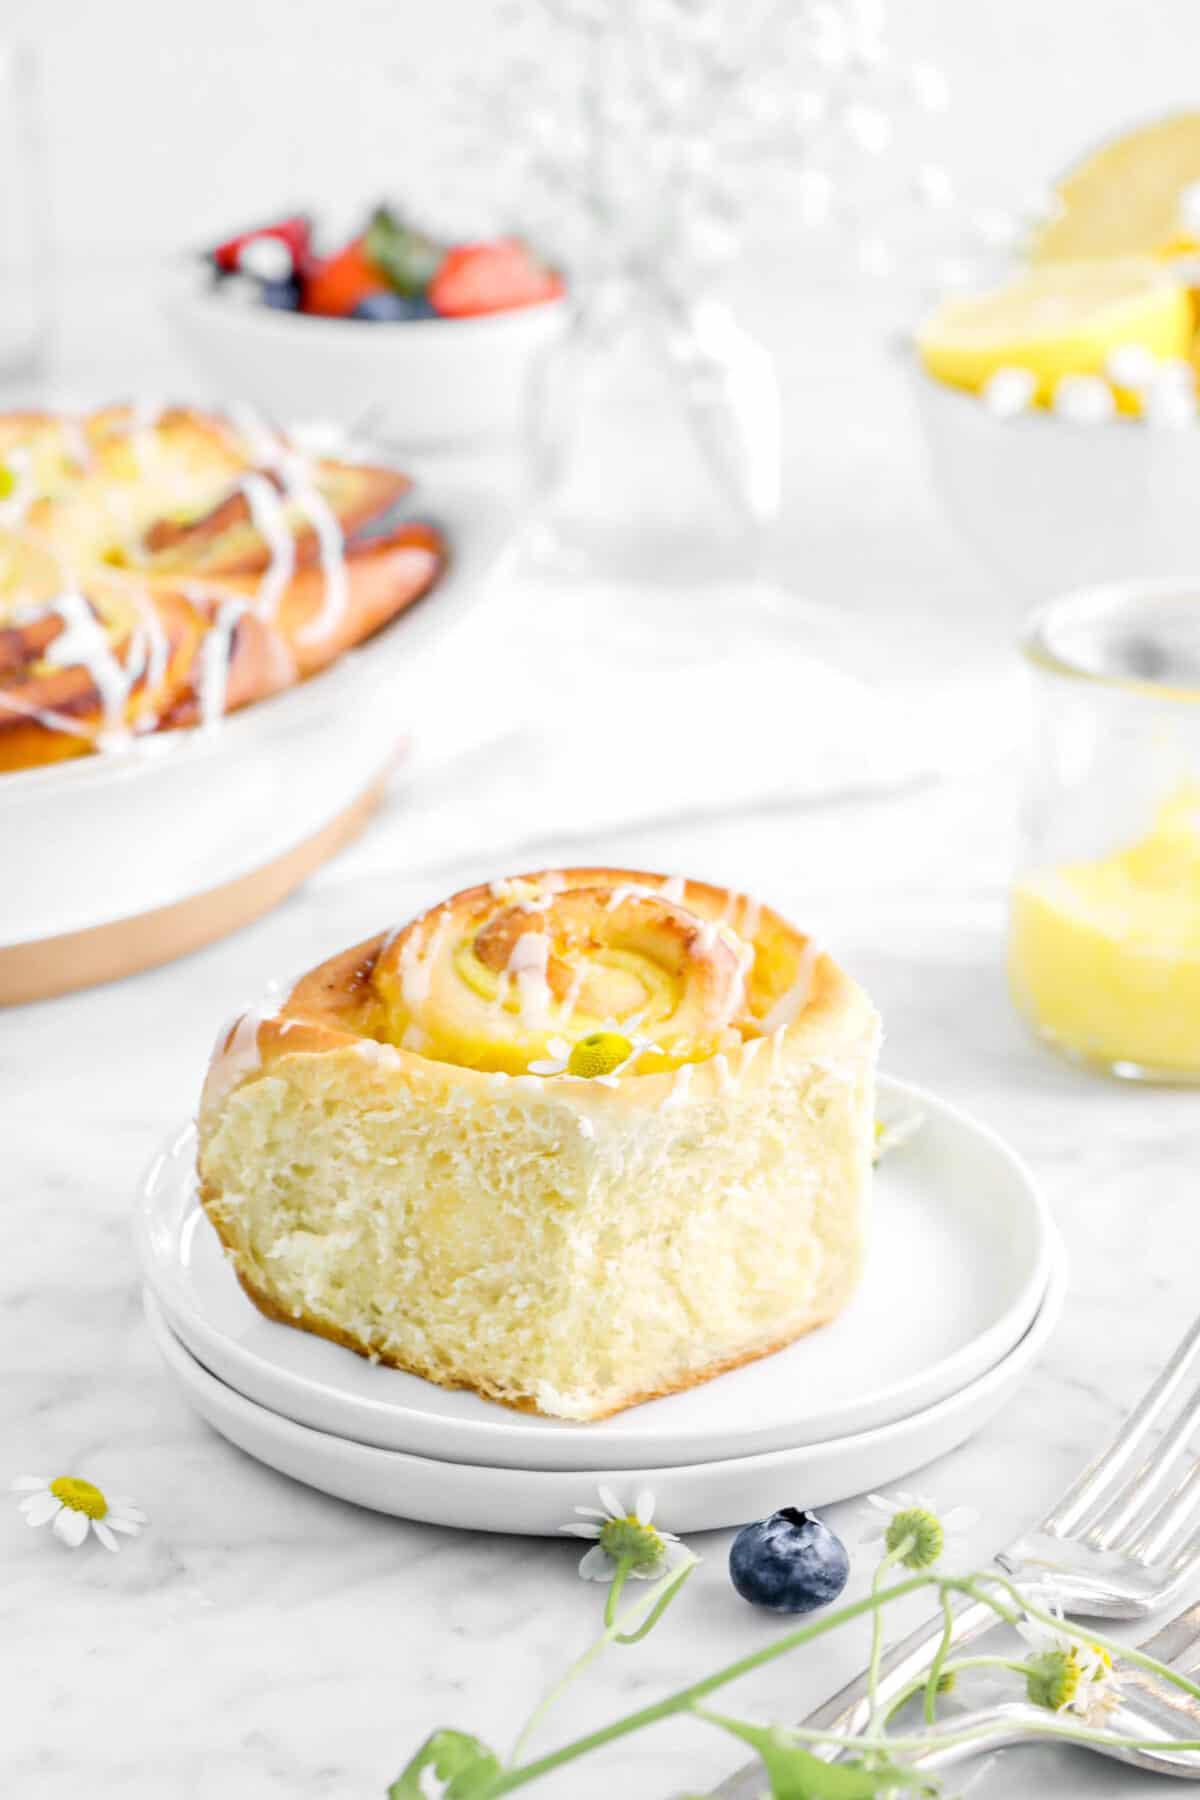 lemon sweer roll on two plates with flowers, lemon custard, berries, and rolls behind